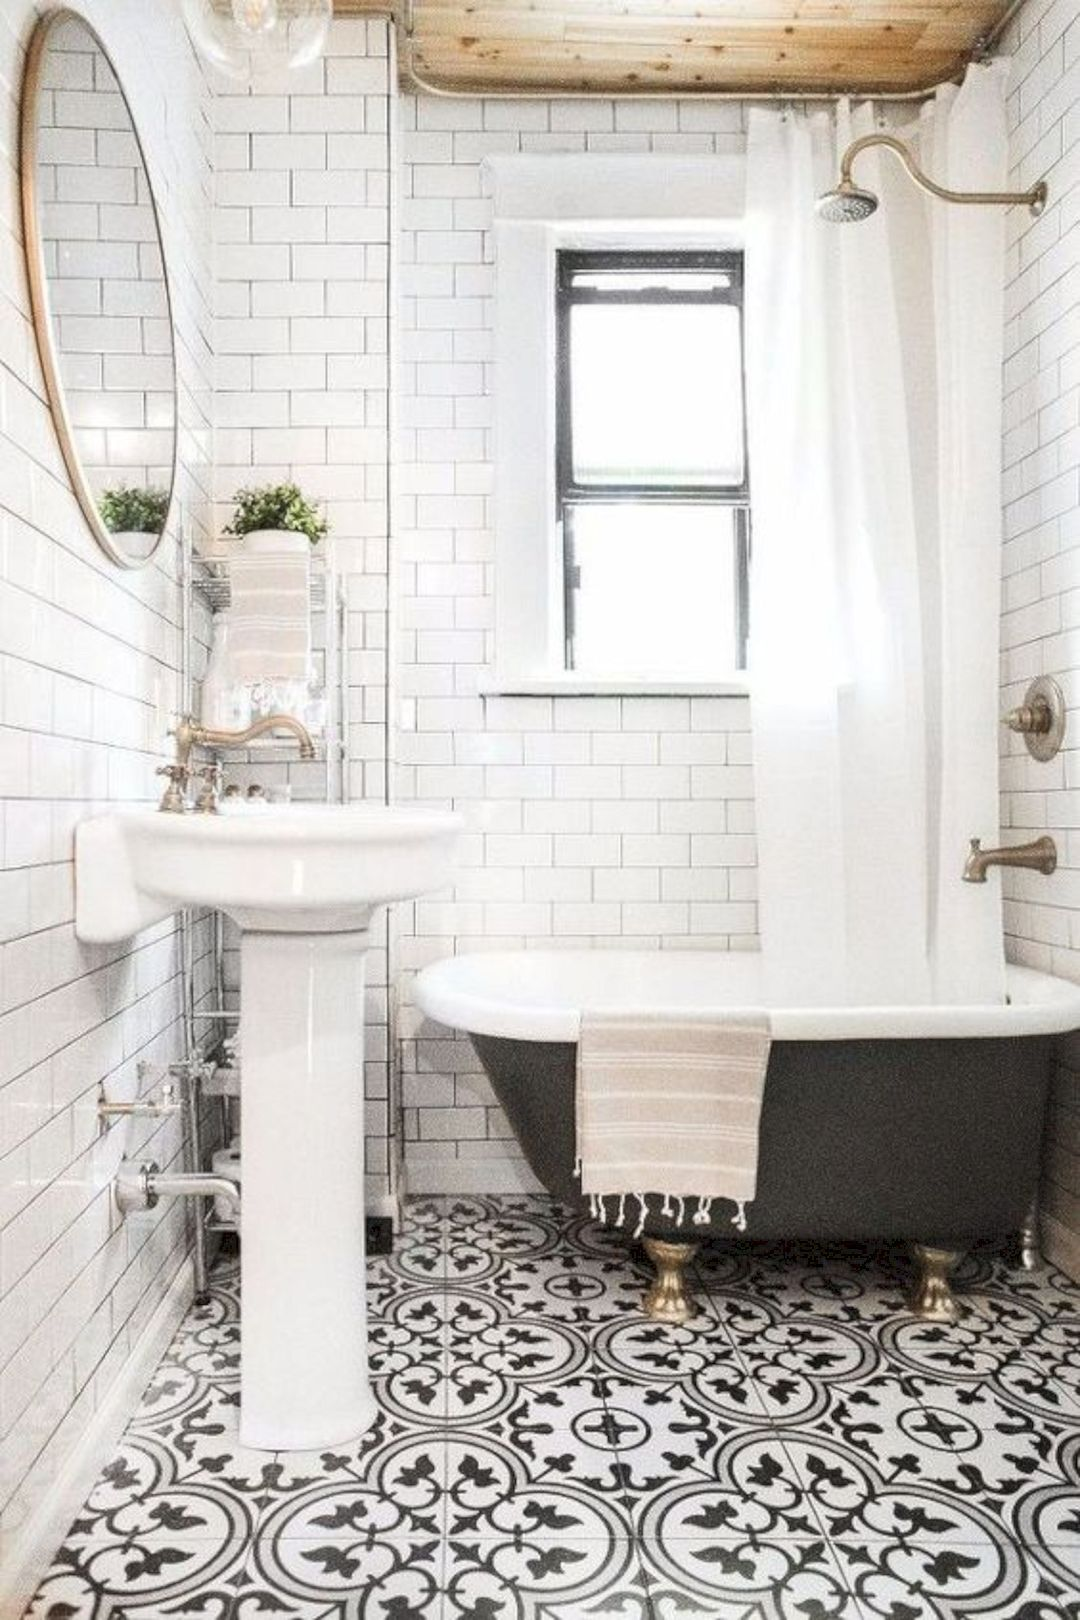 Small Bathroom Renovation Ideas 1 | BATH | Pinterest | Small ...